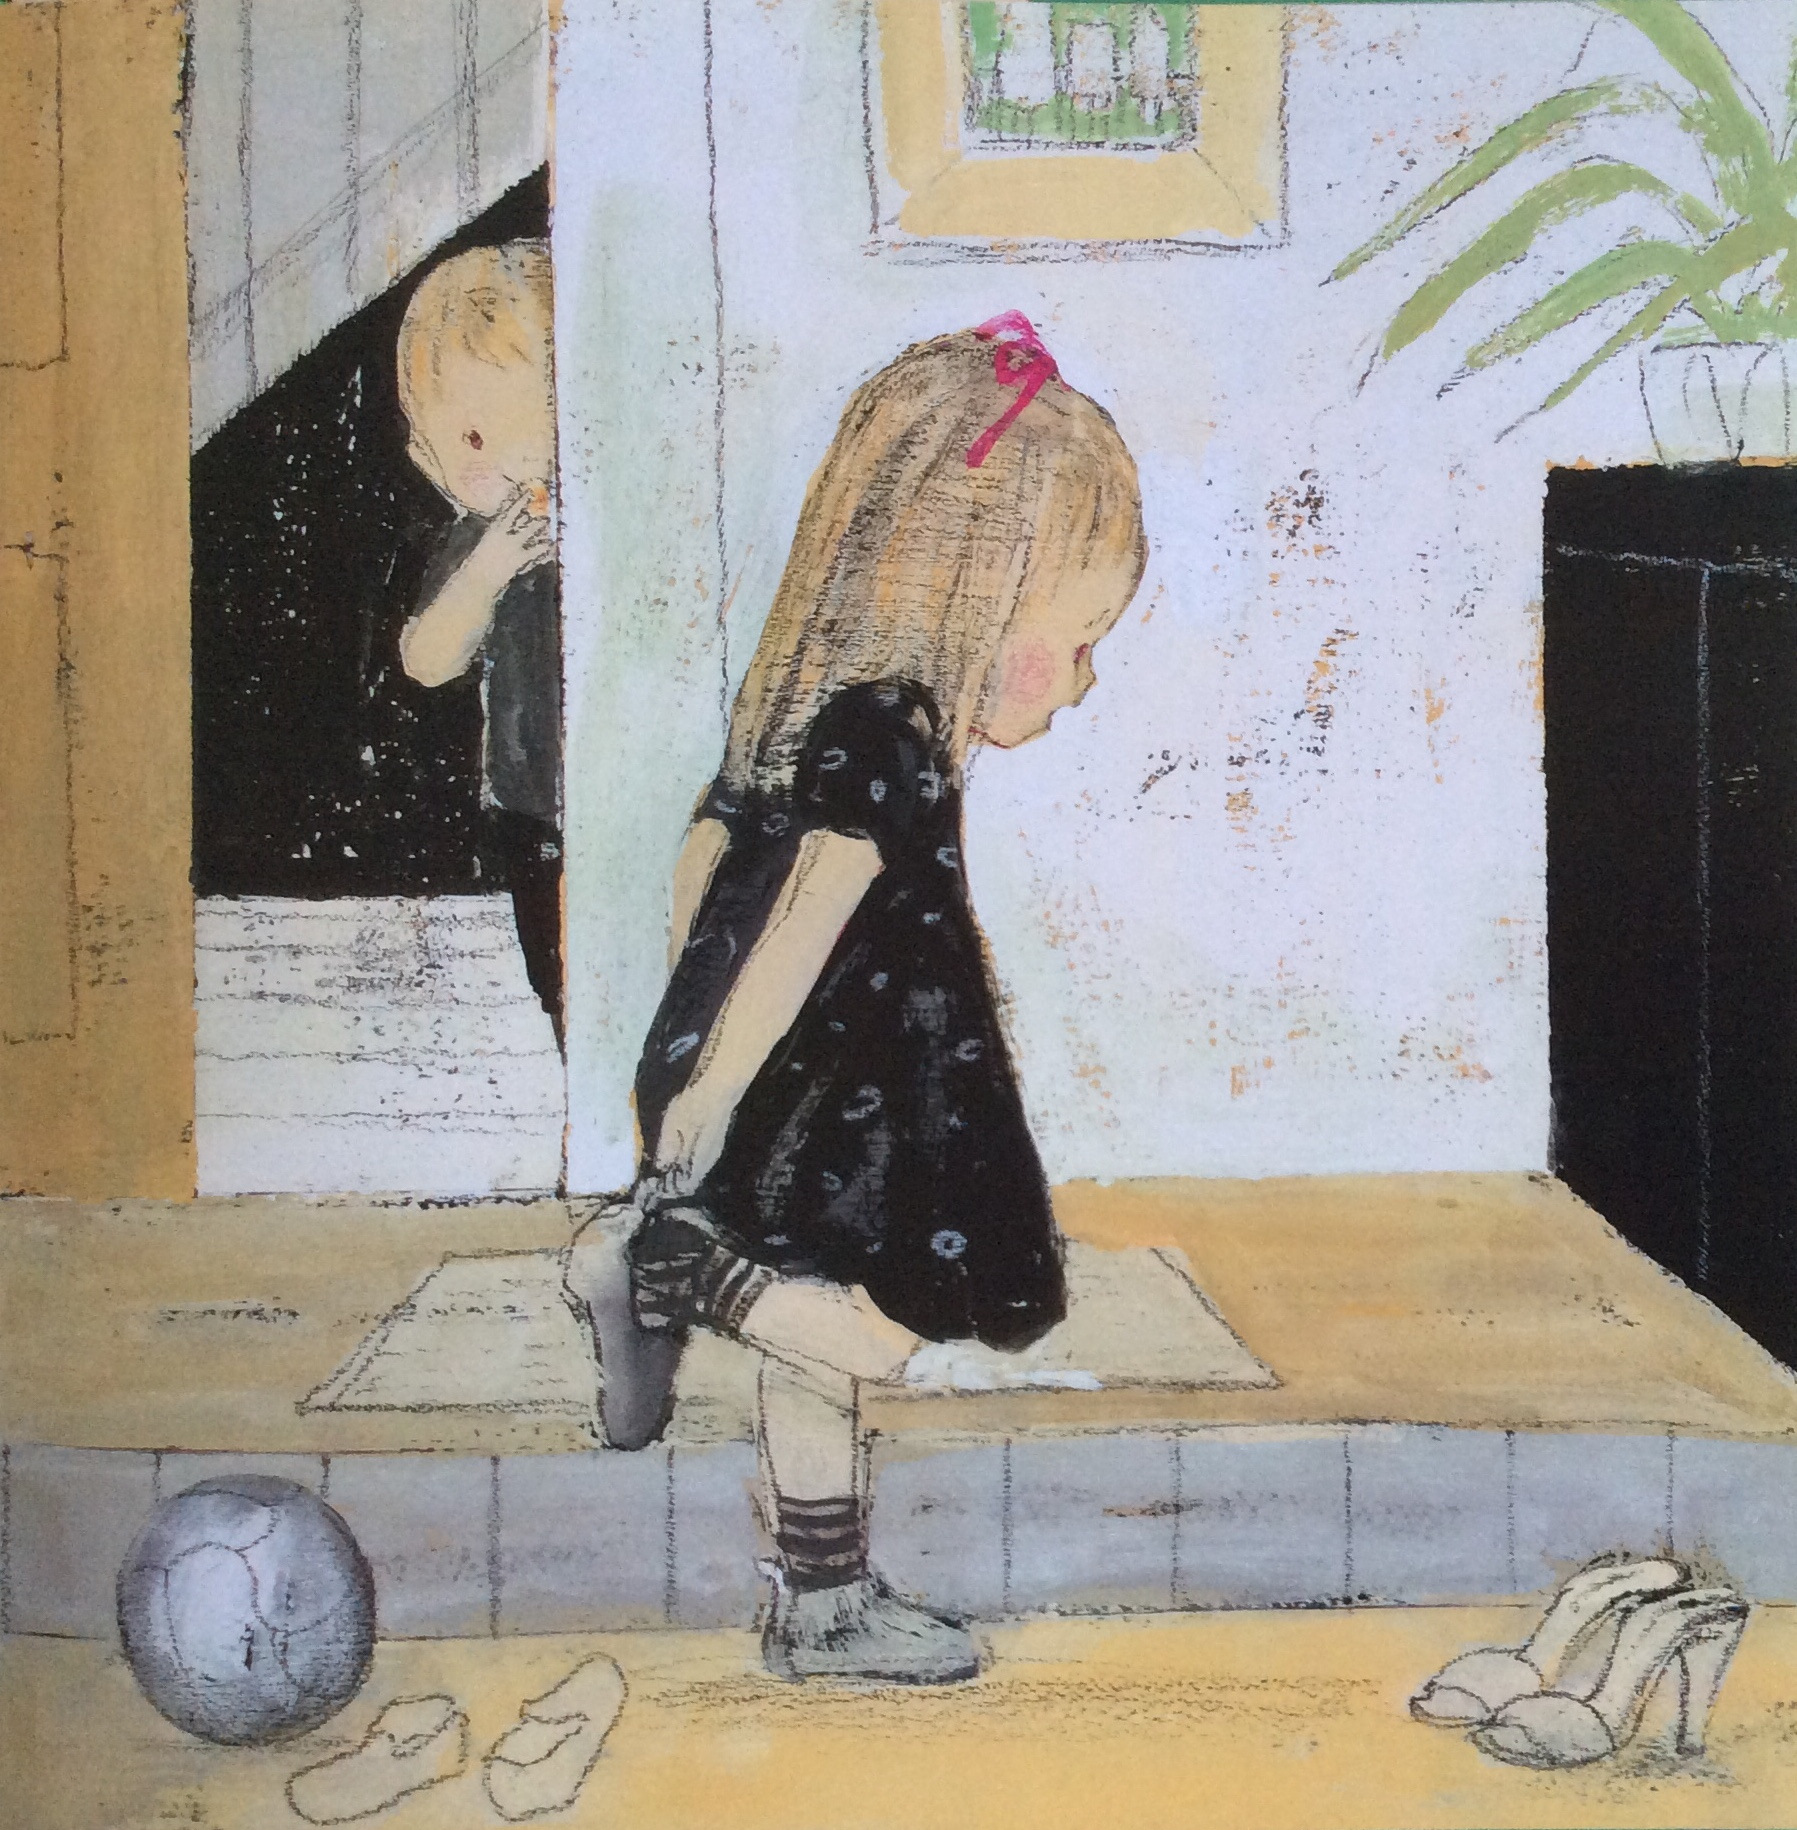 Kimiko Aman, Komako Sakai . POPLAR Publishing Co. Ltd., Japan 2003